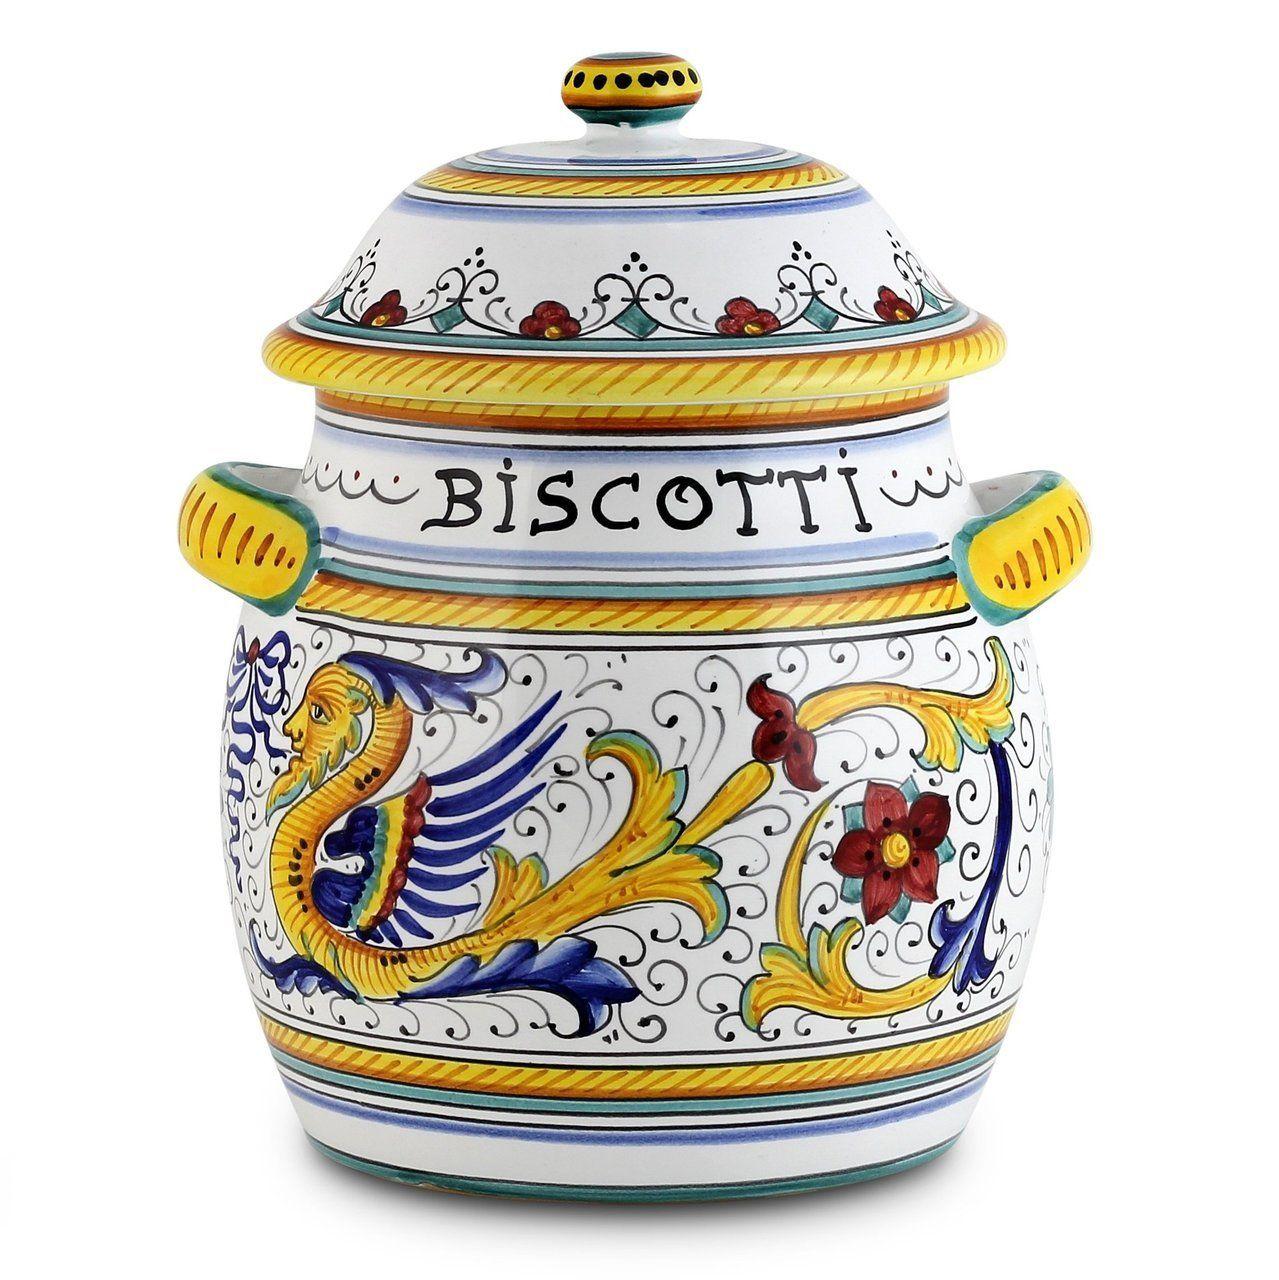 A Tradition of Italian Ceramics Deruta